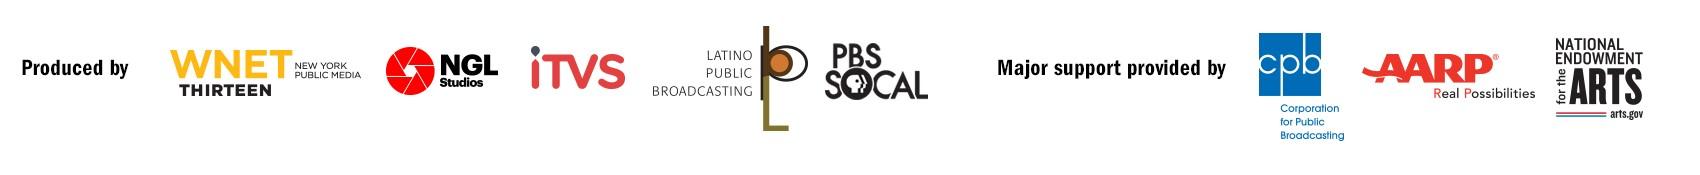 press release logos